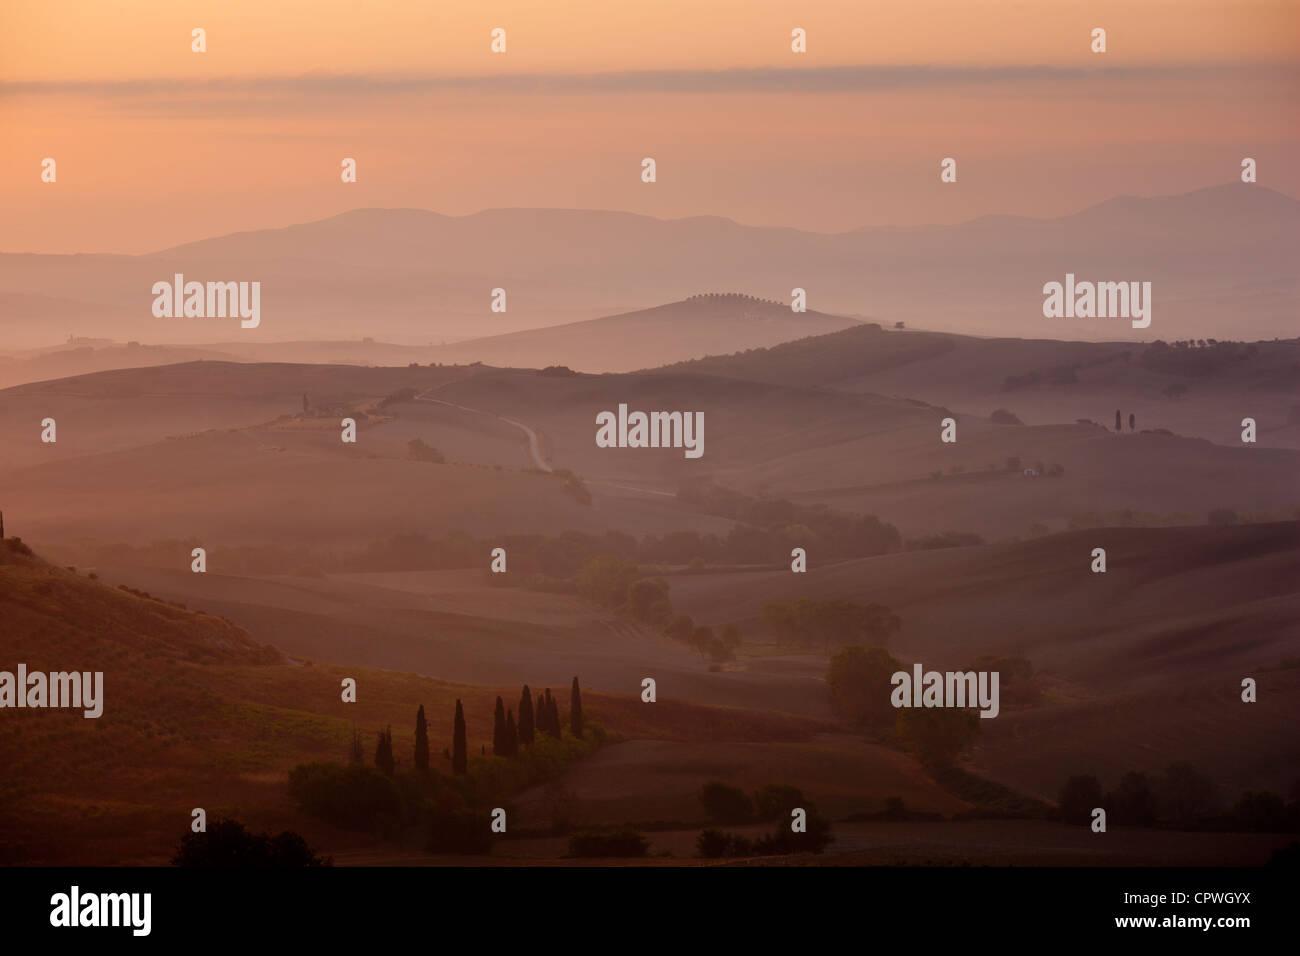 Toskanischer Landschaft des Hügels Pisten im Val D'Orcia, Toskana, Italien Stockbild